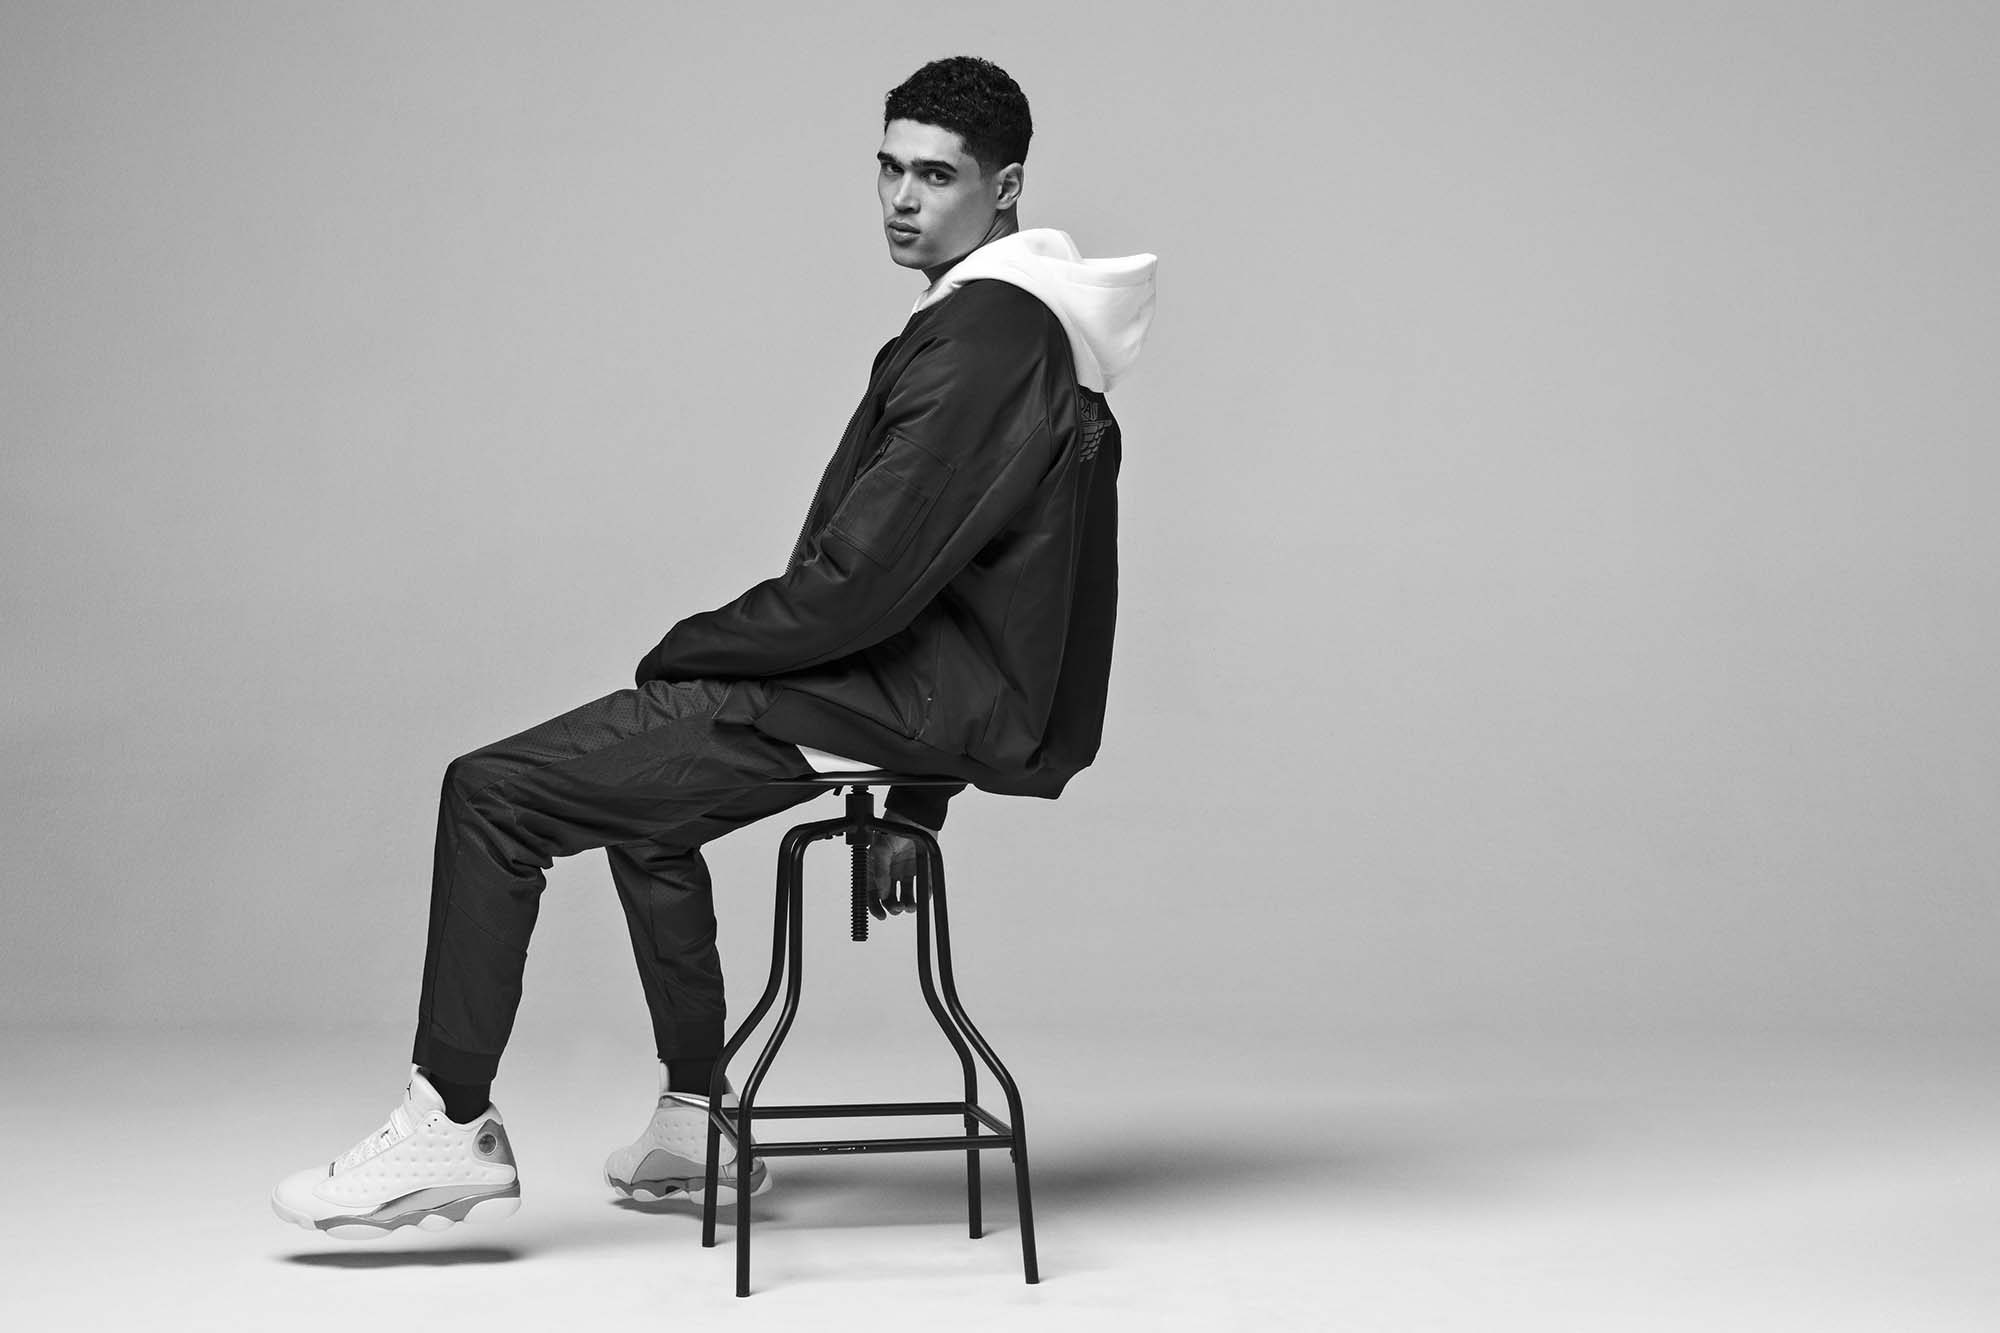 jordan-brand-2017-aw-clothing-collection-006